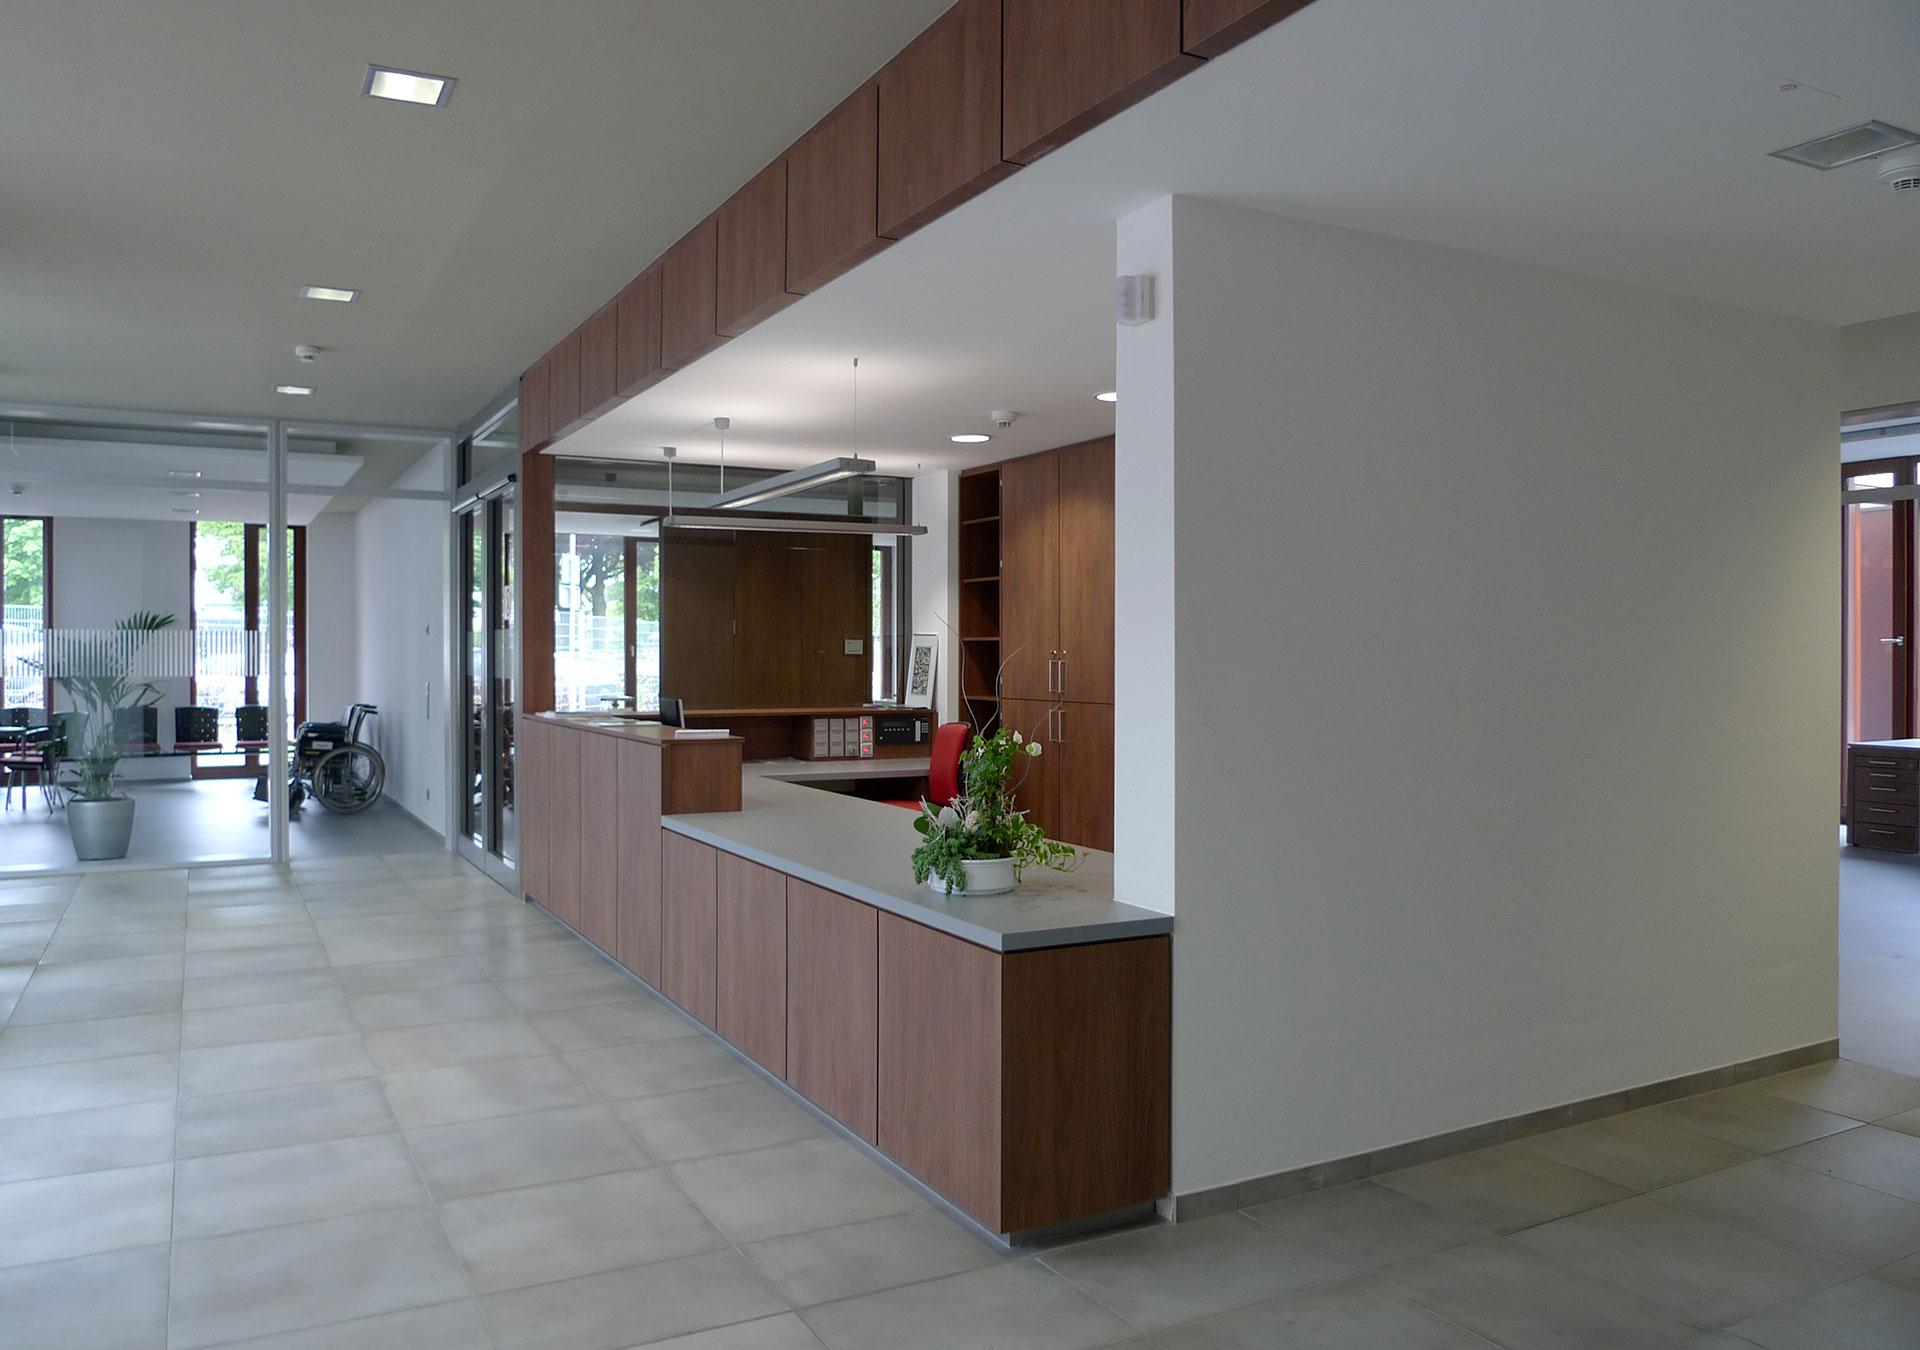 Architekten Kleve dialysestation kleve wrede architekten